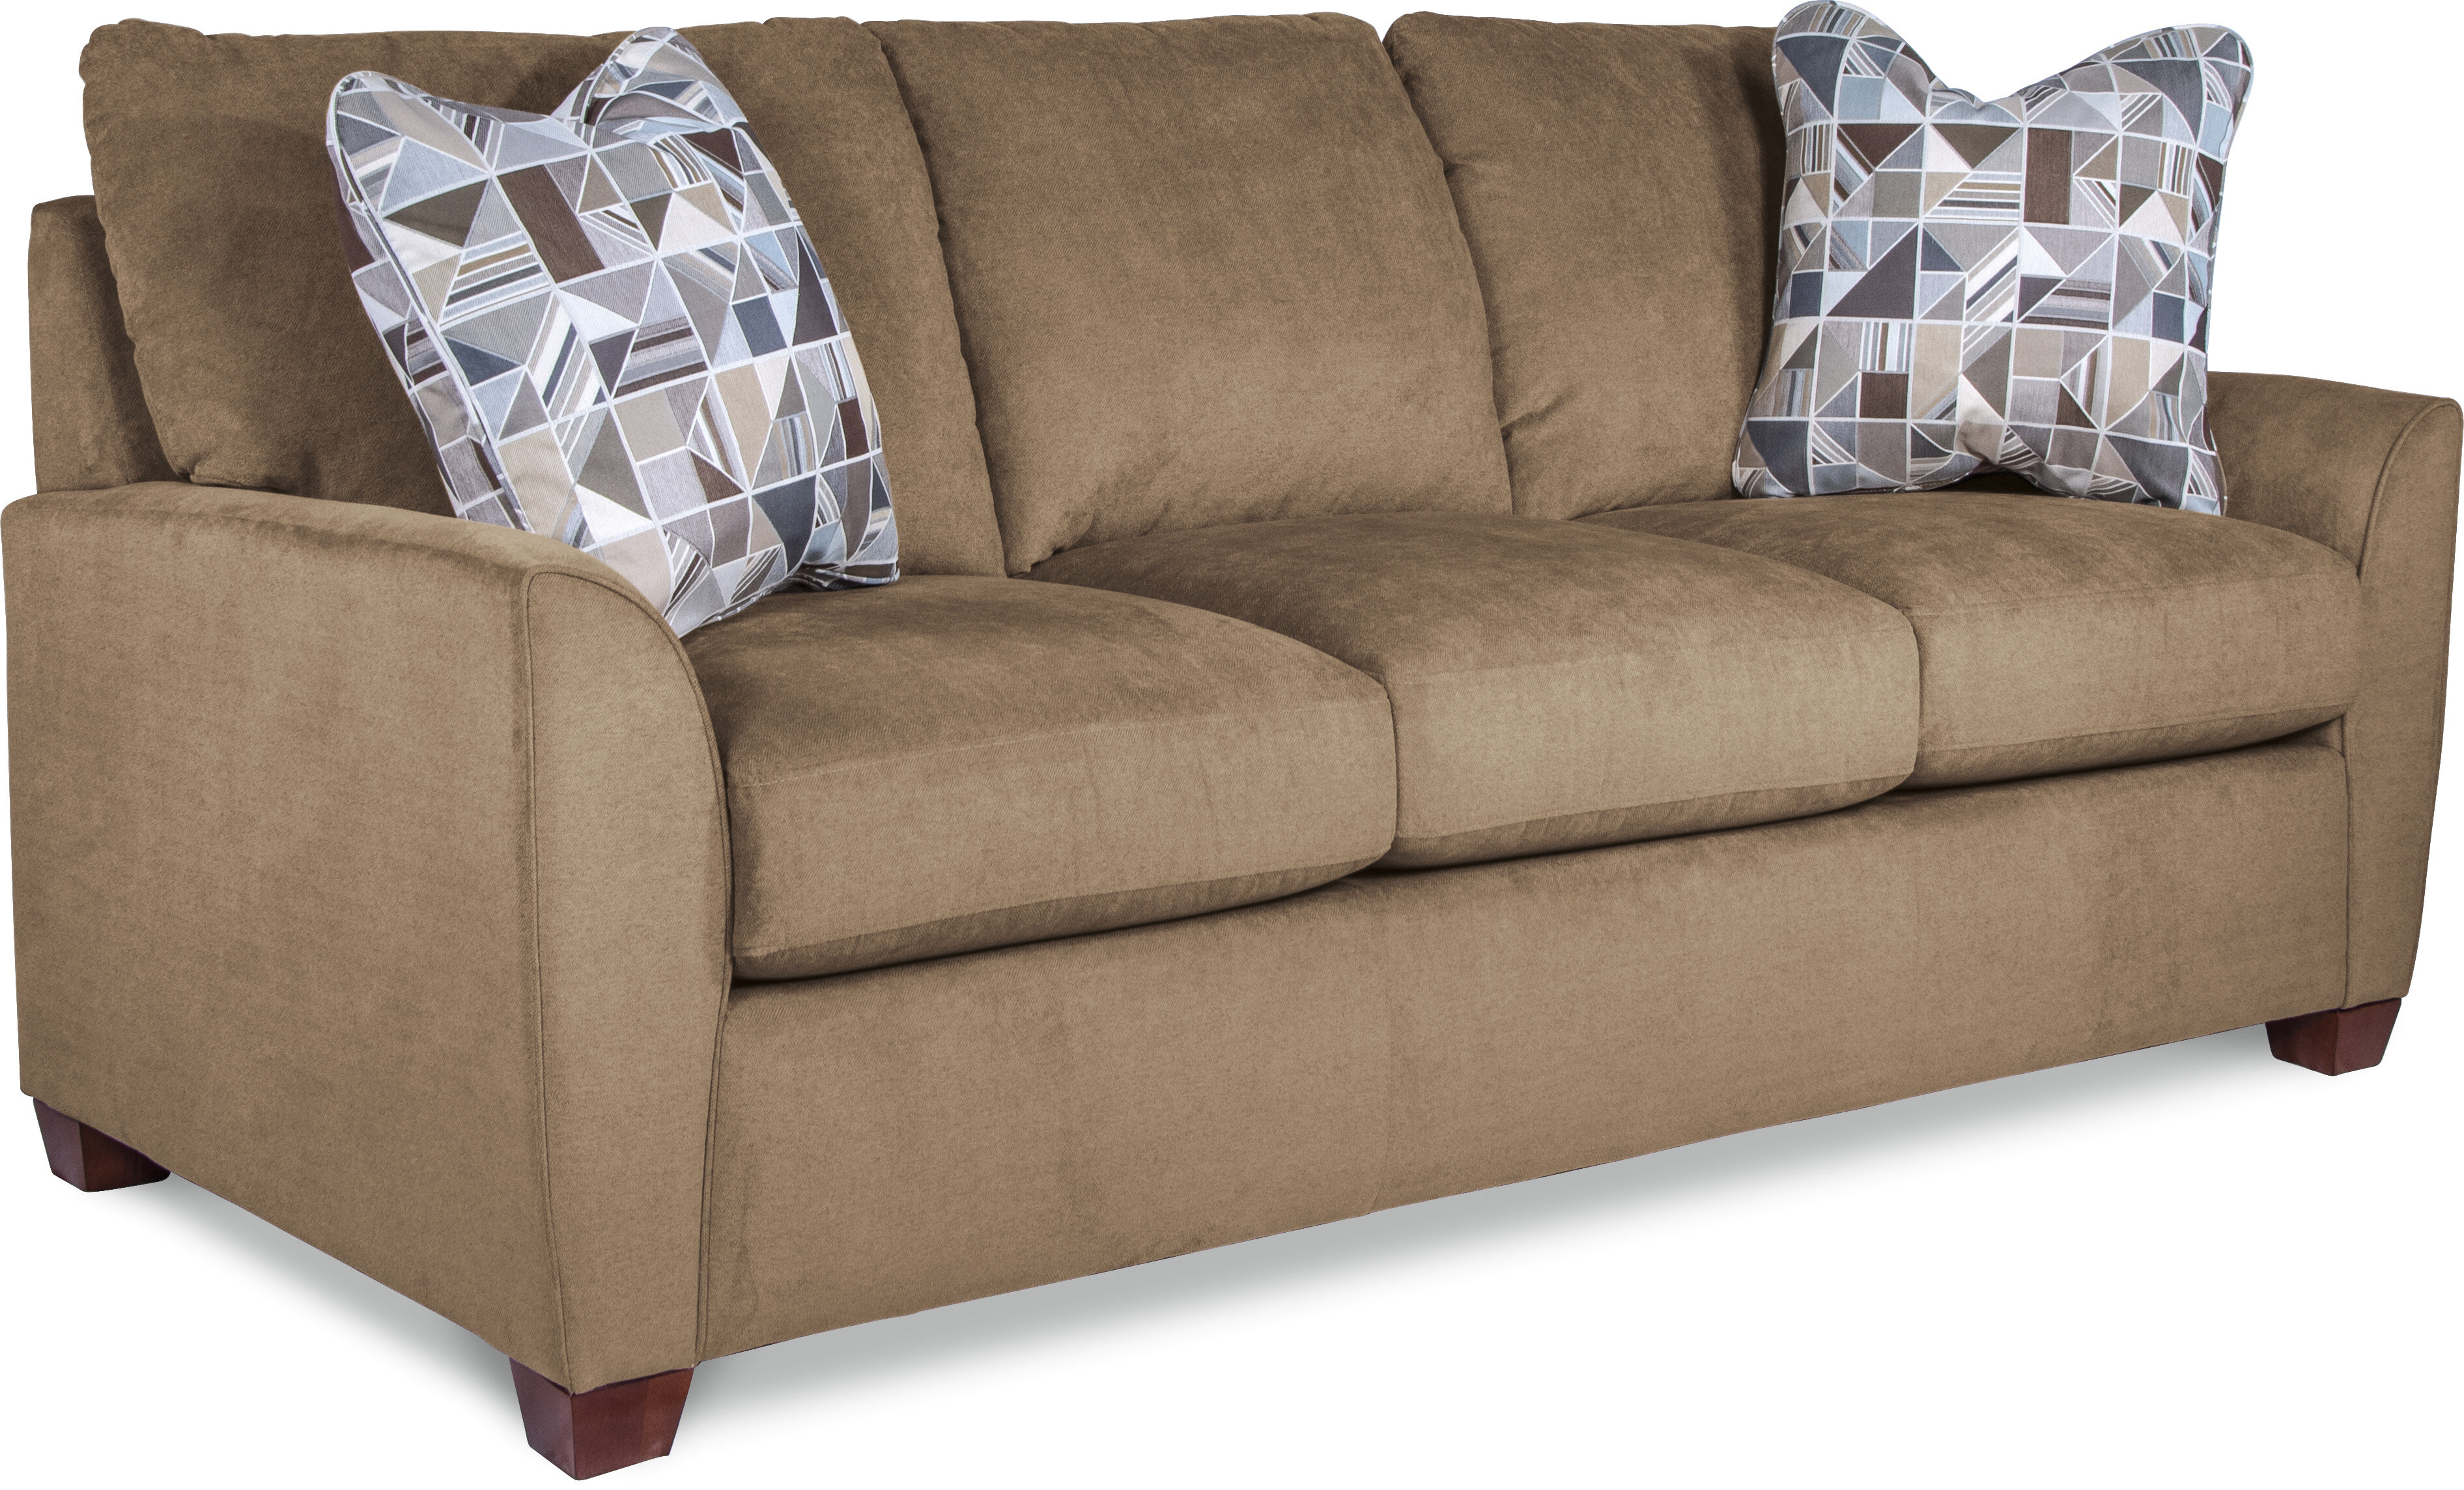 La Z Boy Amy Premier Supreme Comfort Sleeper Sofa | Wayfair